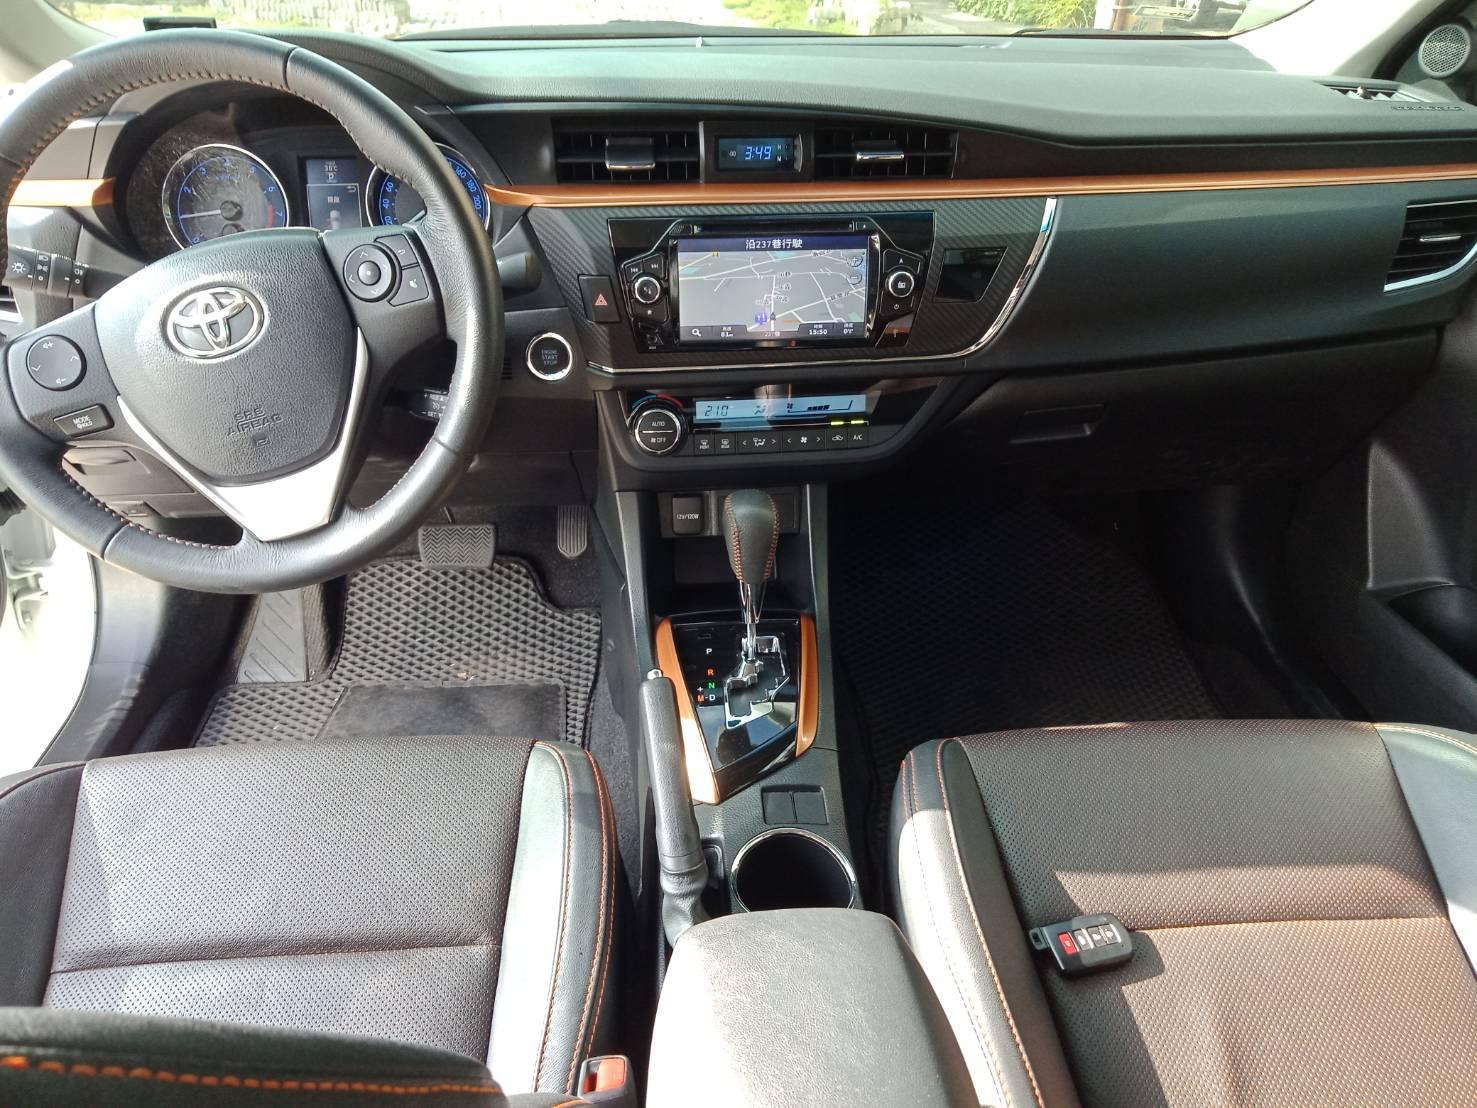 ALTIS X版 全額貸 低利率 找錢 車換車 皆可辦理